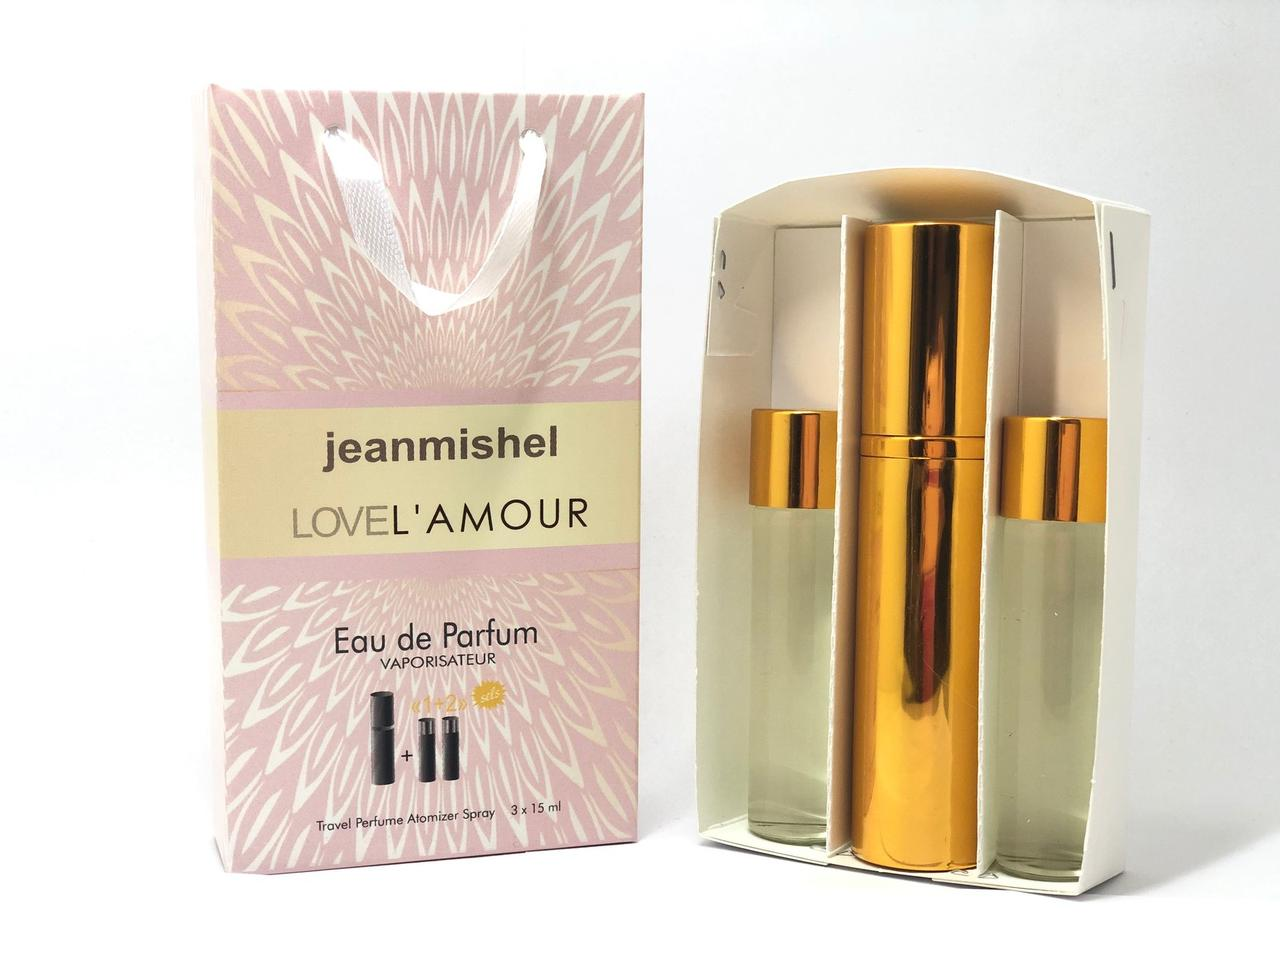 Мини парфюм в подарочной упаковке jeanmishel lovelLamour 45мл